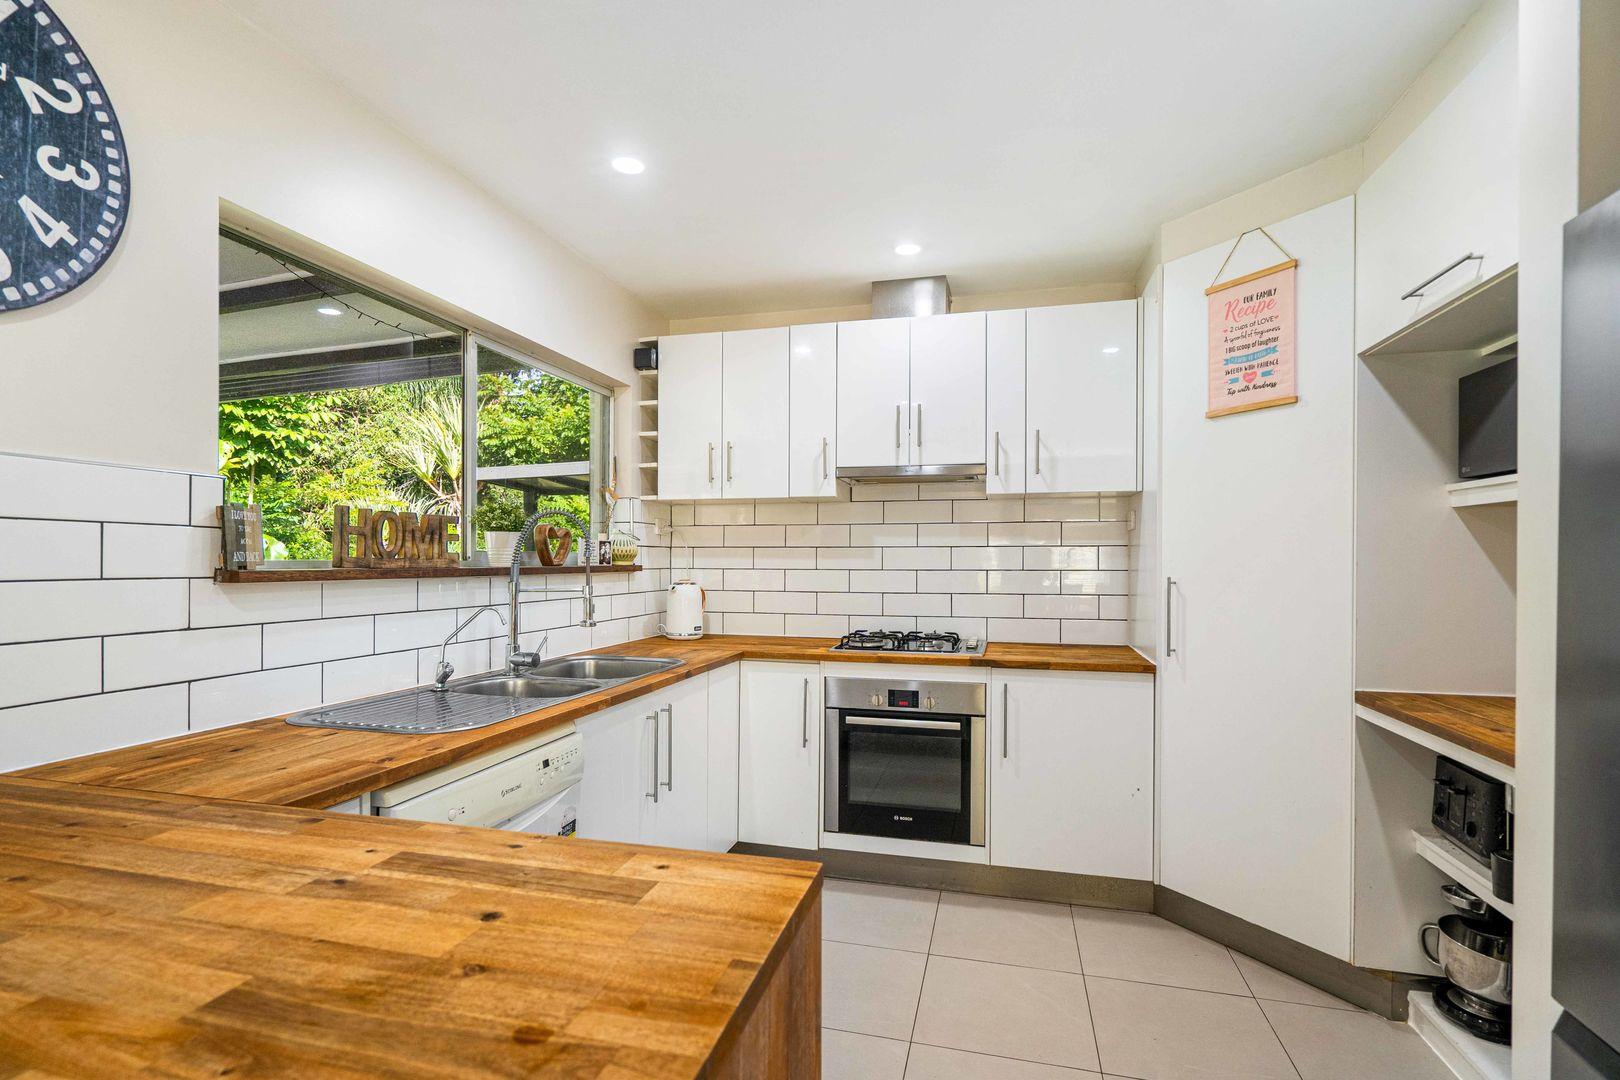 305 Palmwoods-montville Rd, Palmwoods QLD 4555, Image 2